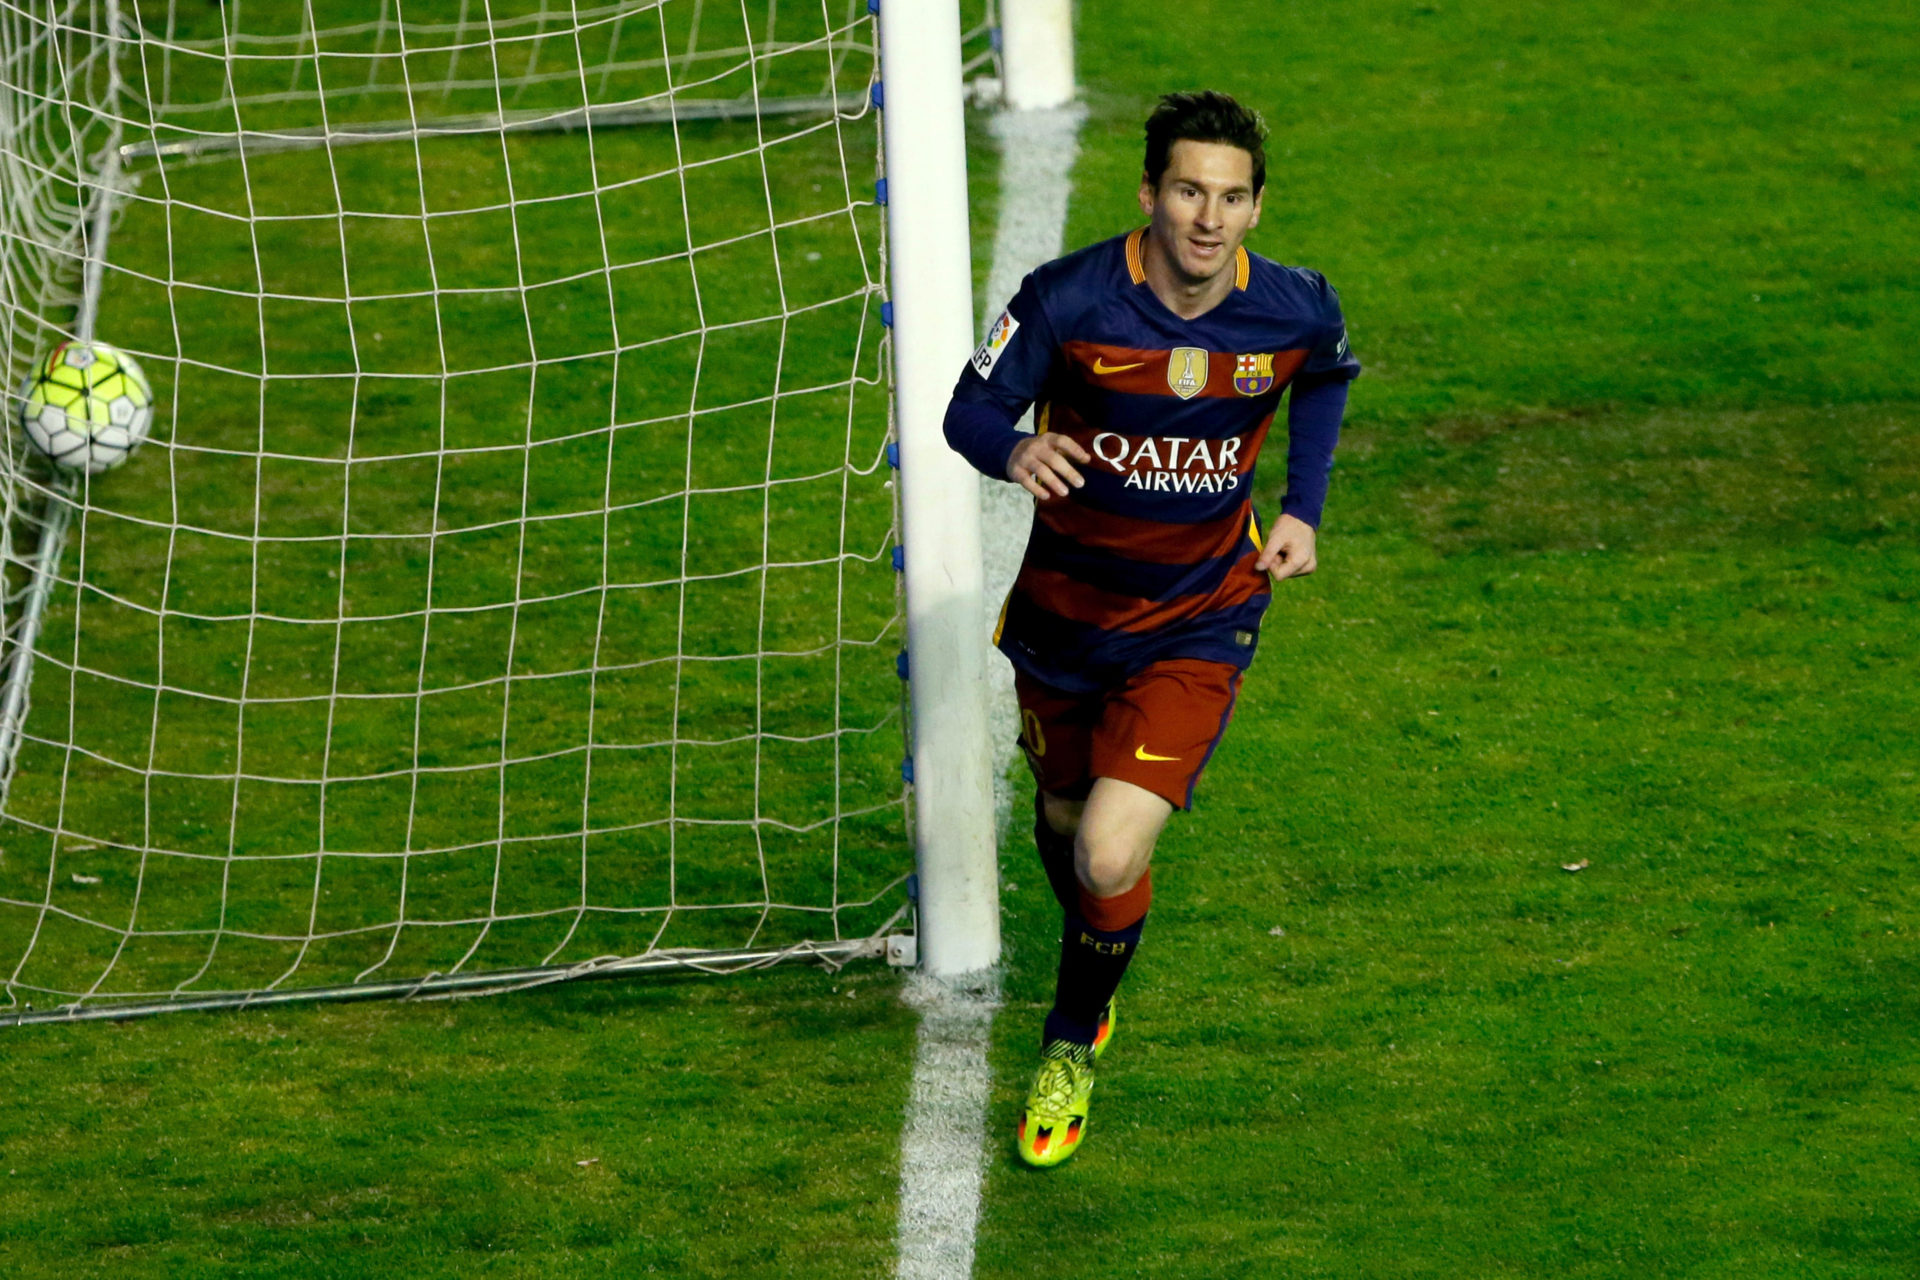 Messi celebra un gol anotado ante el Rayo Vallecano en Liga BBVA